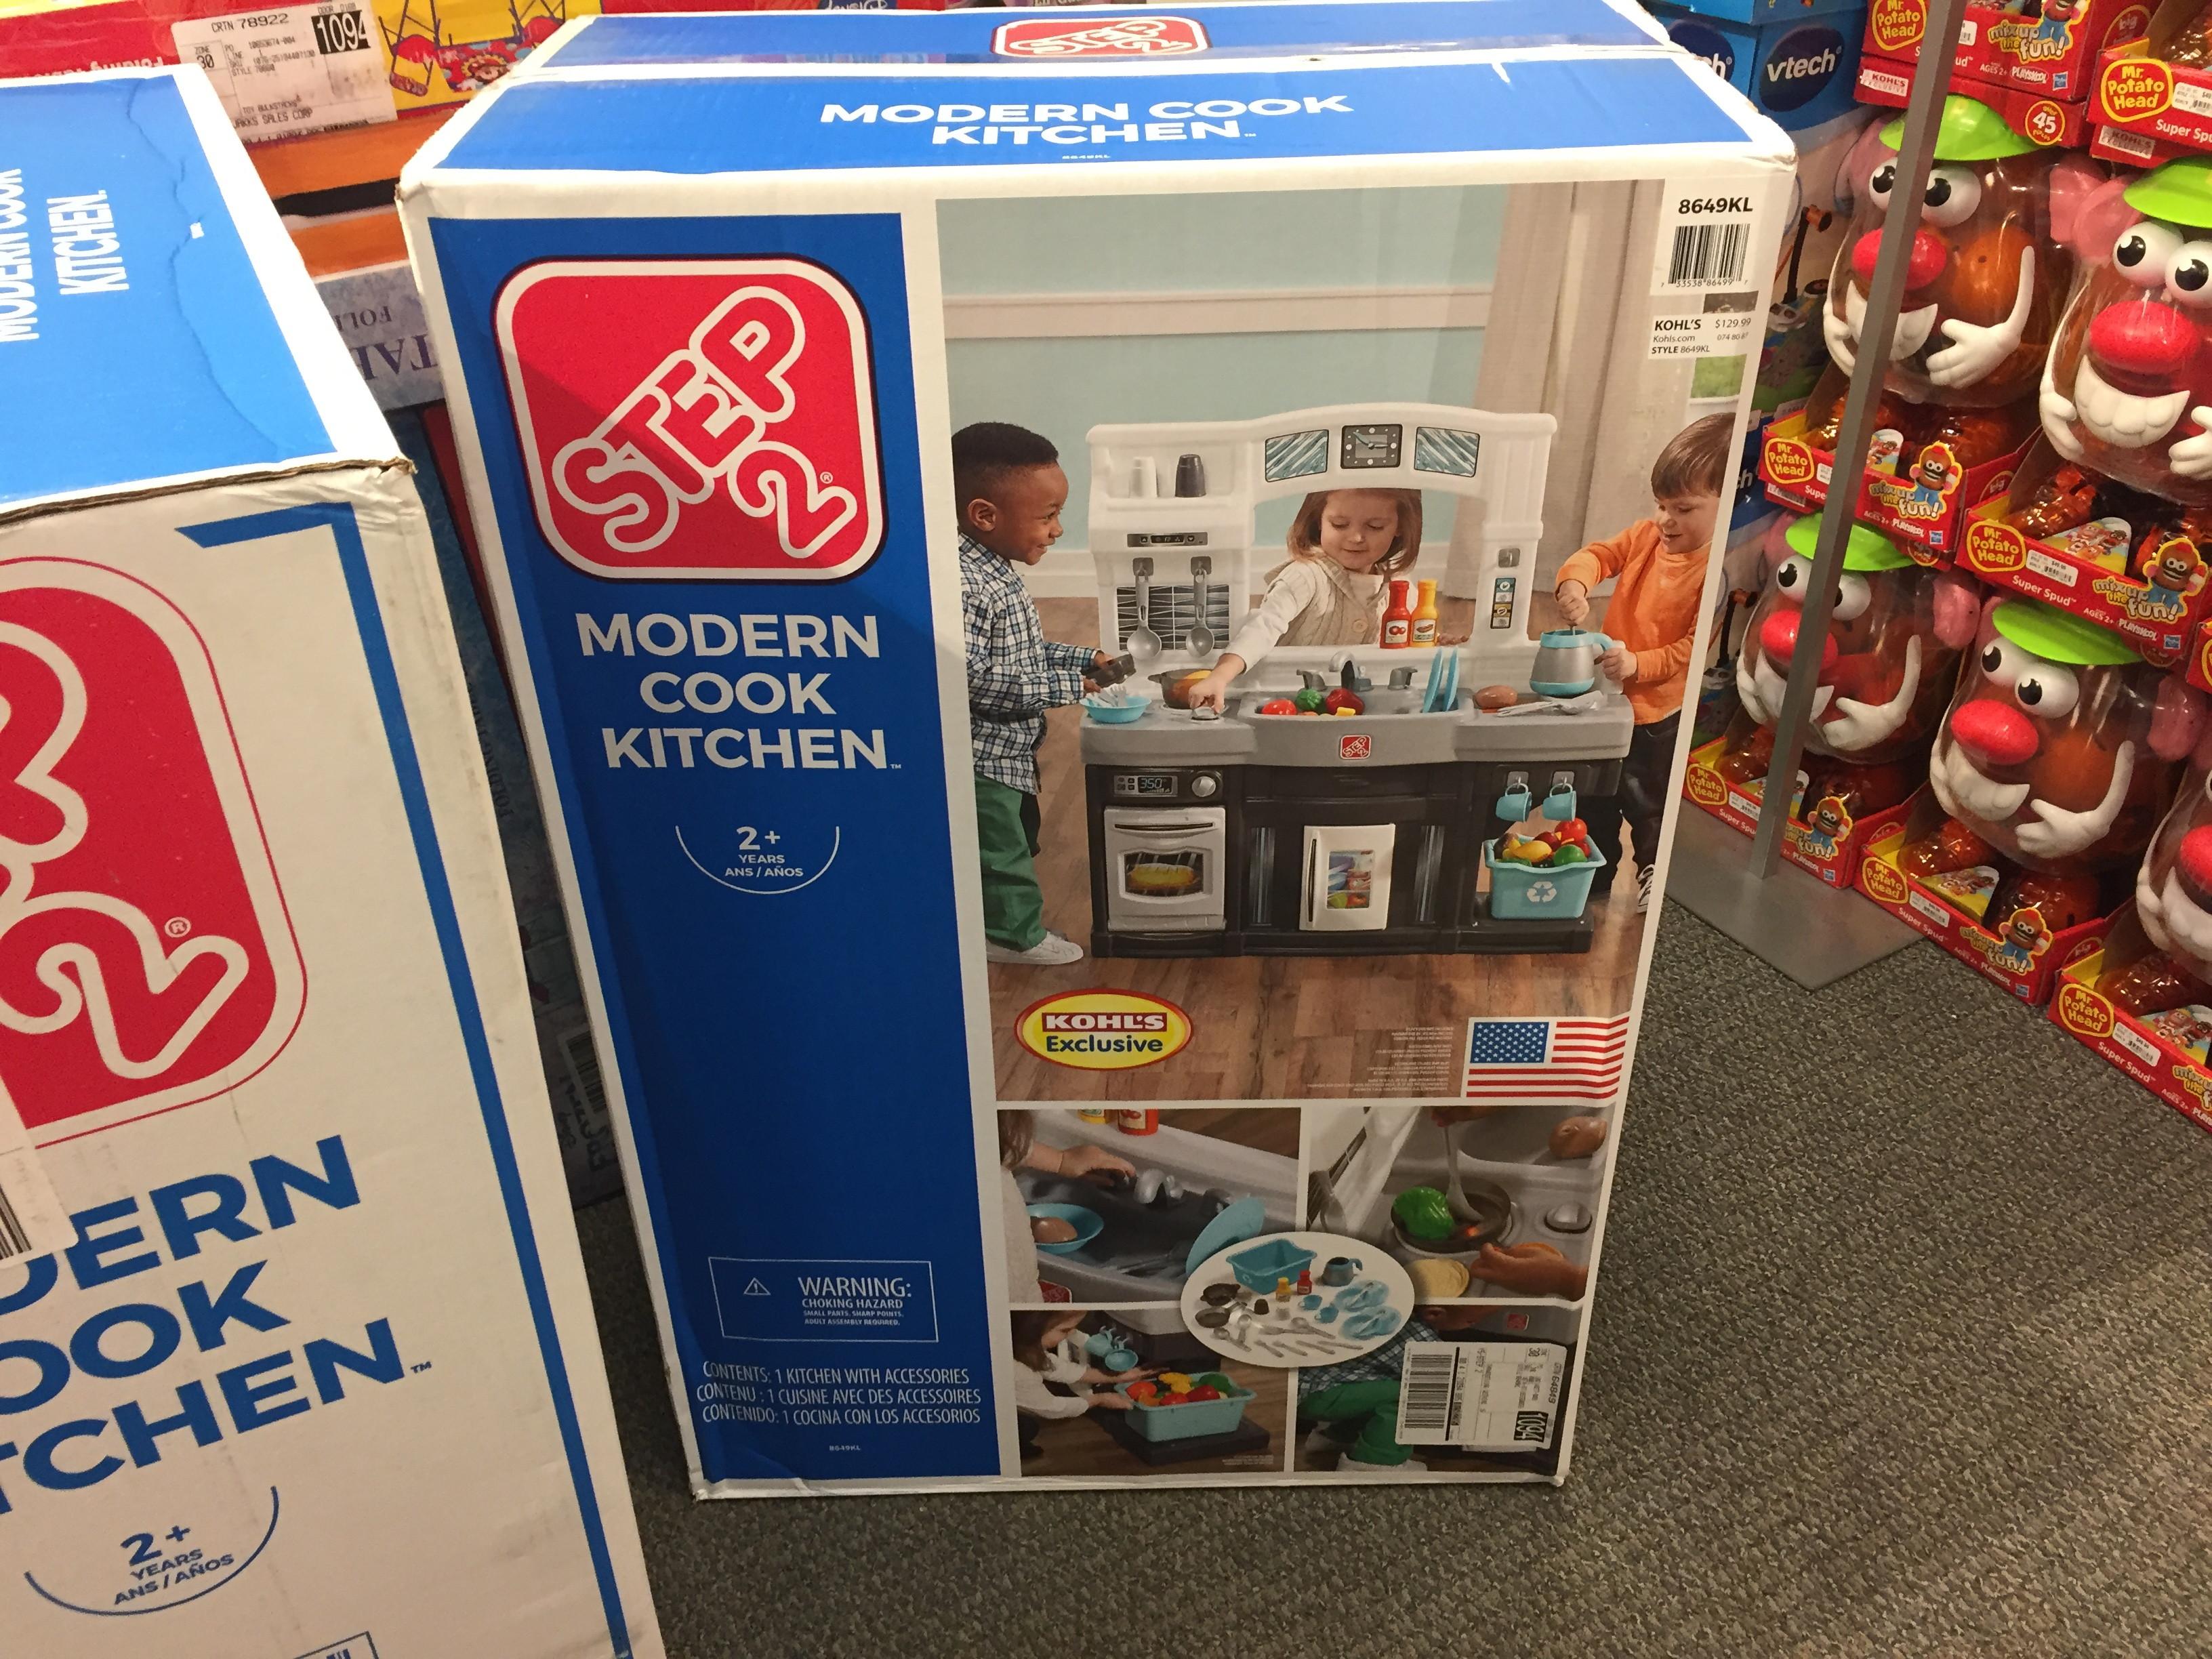 Step2 Modern Cook Kitchen Set ly at Kohls Normally